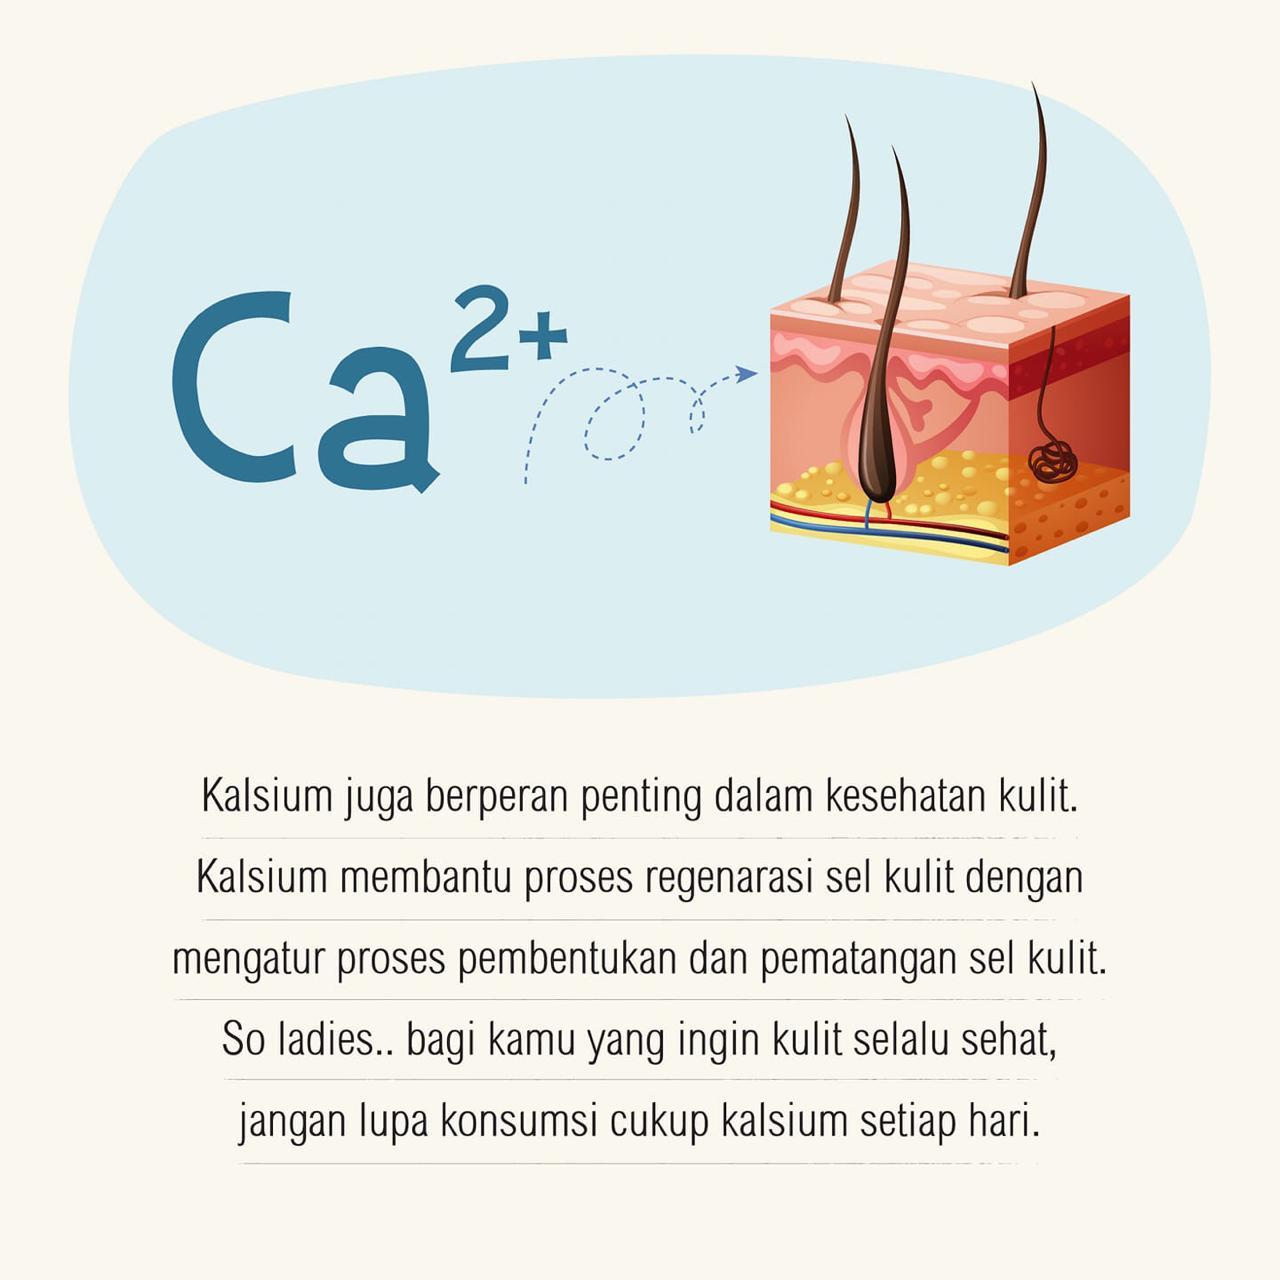 Apa itu Kalsium?